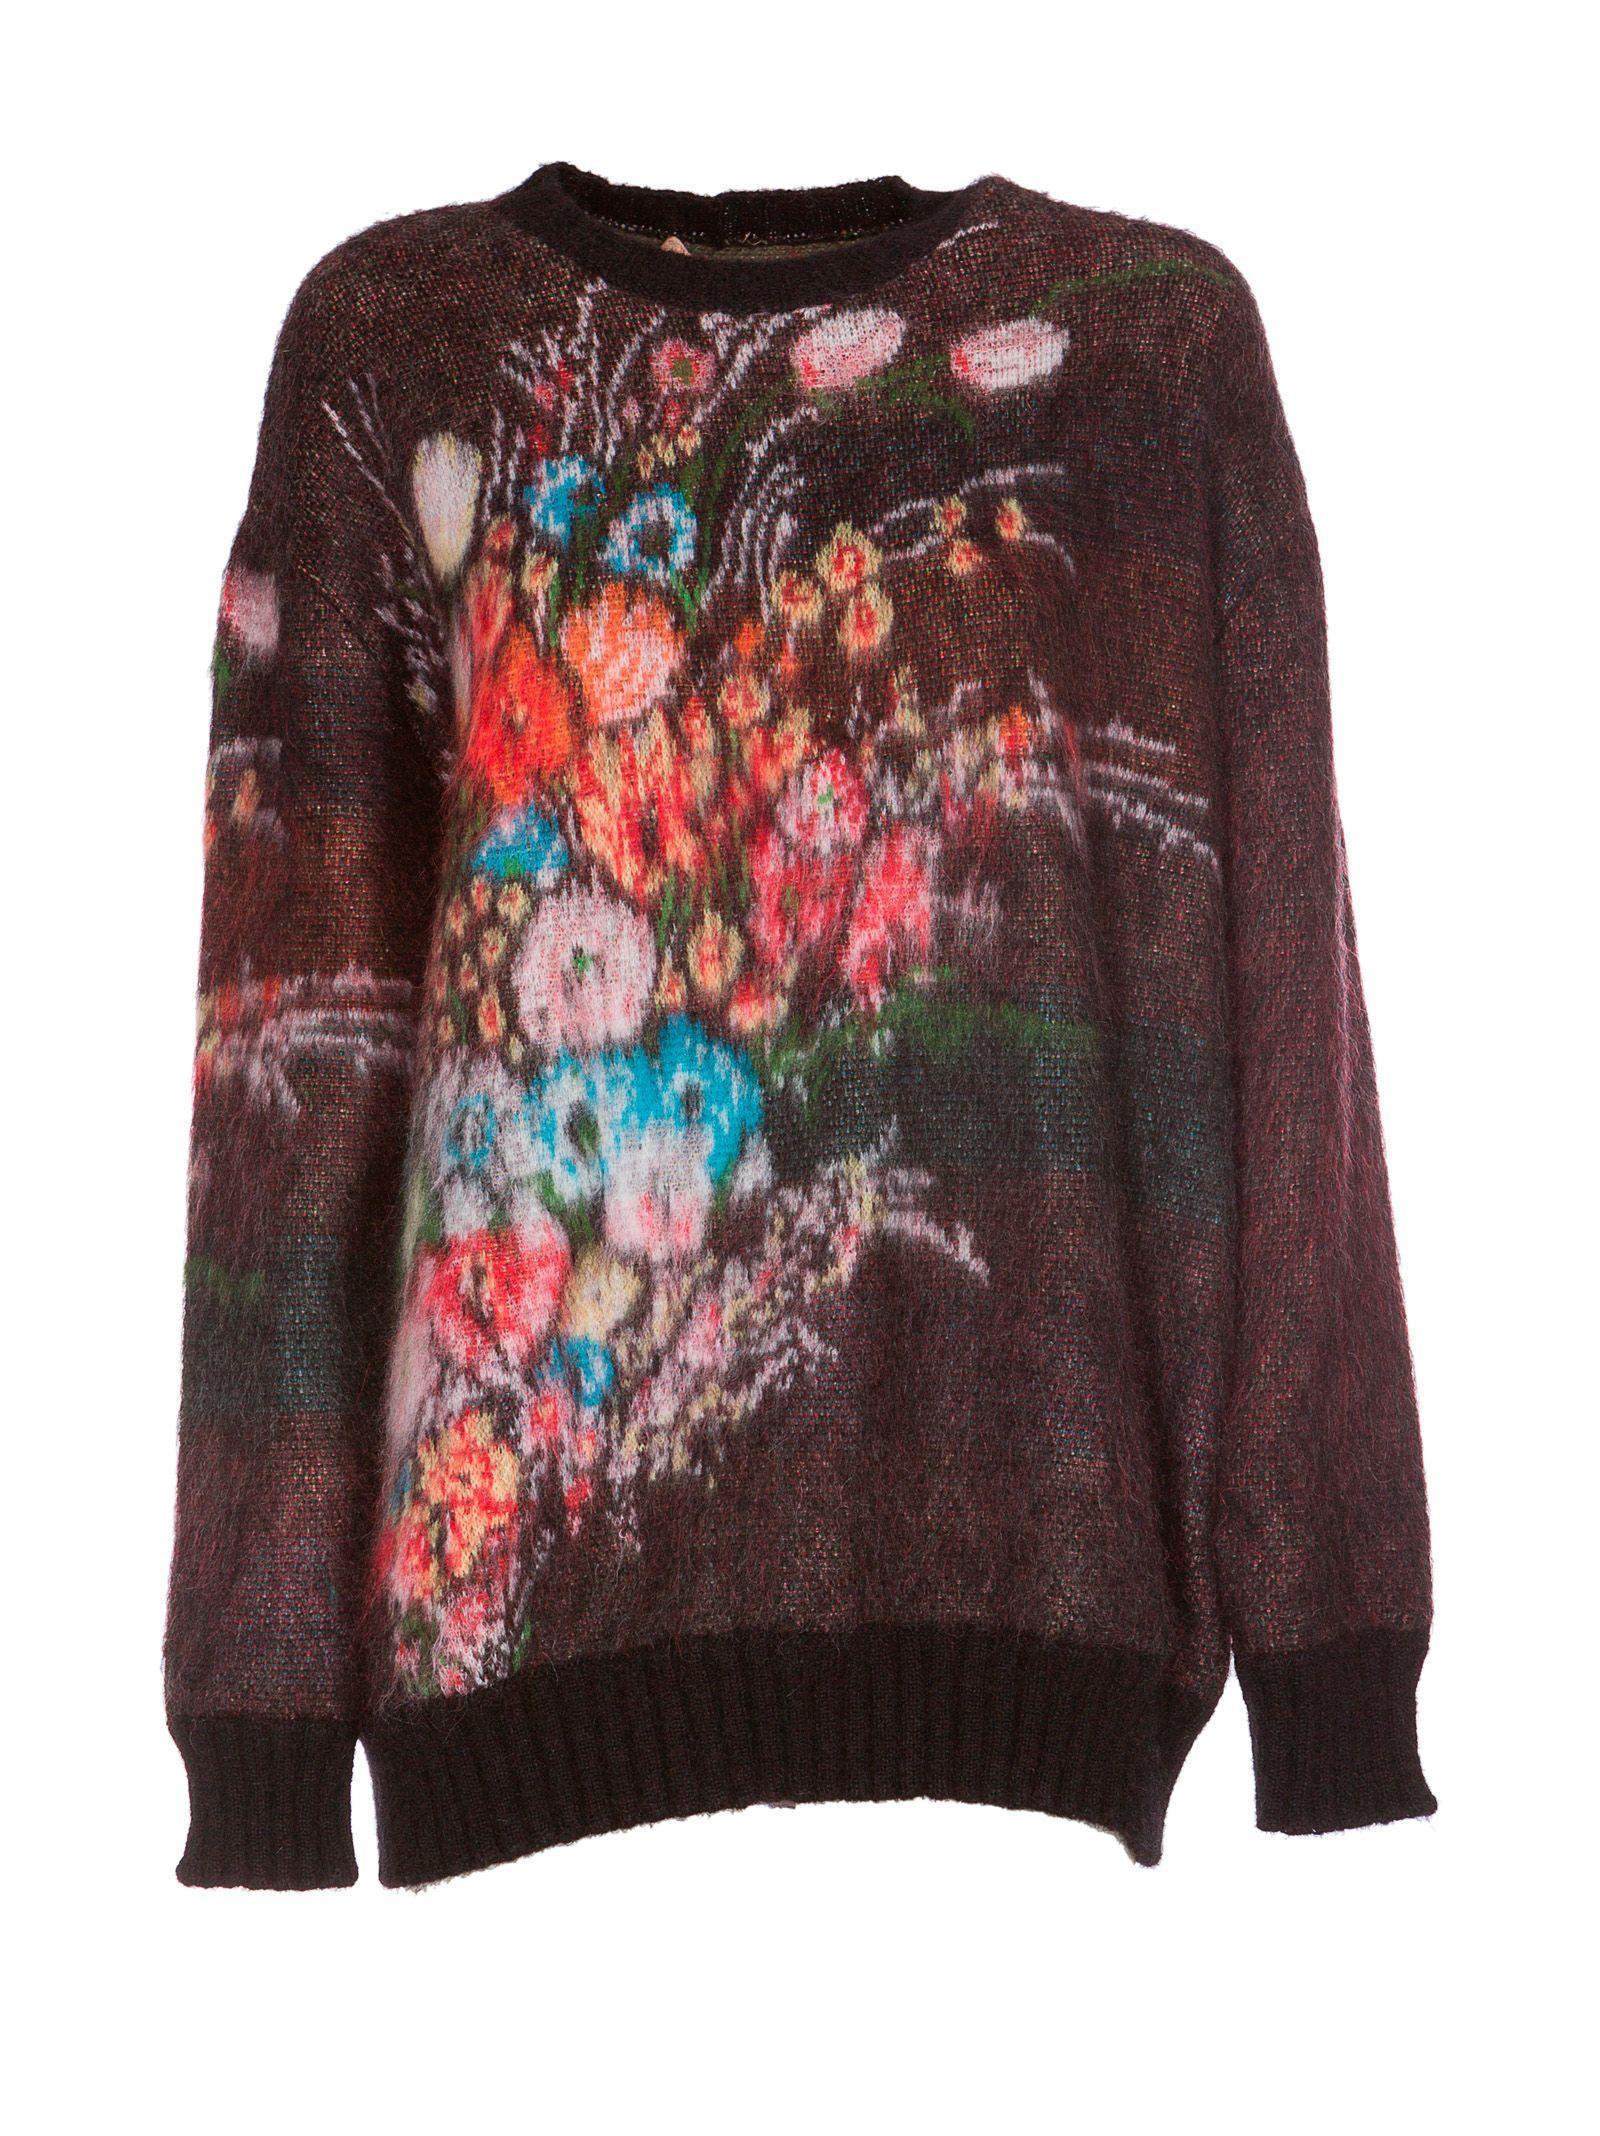 N°21 No21 Floral Print Sweater